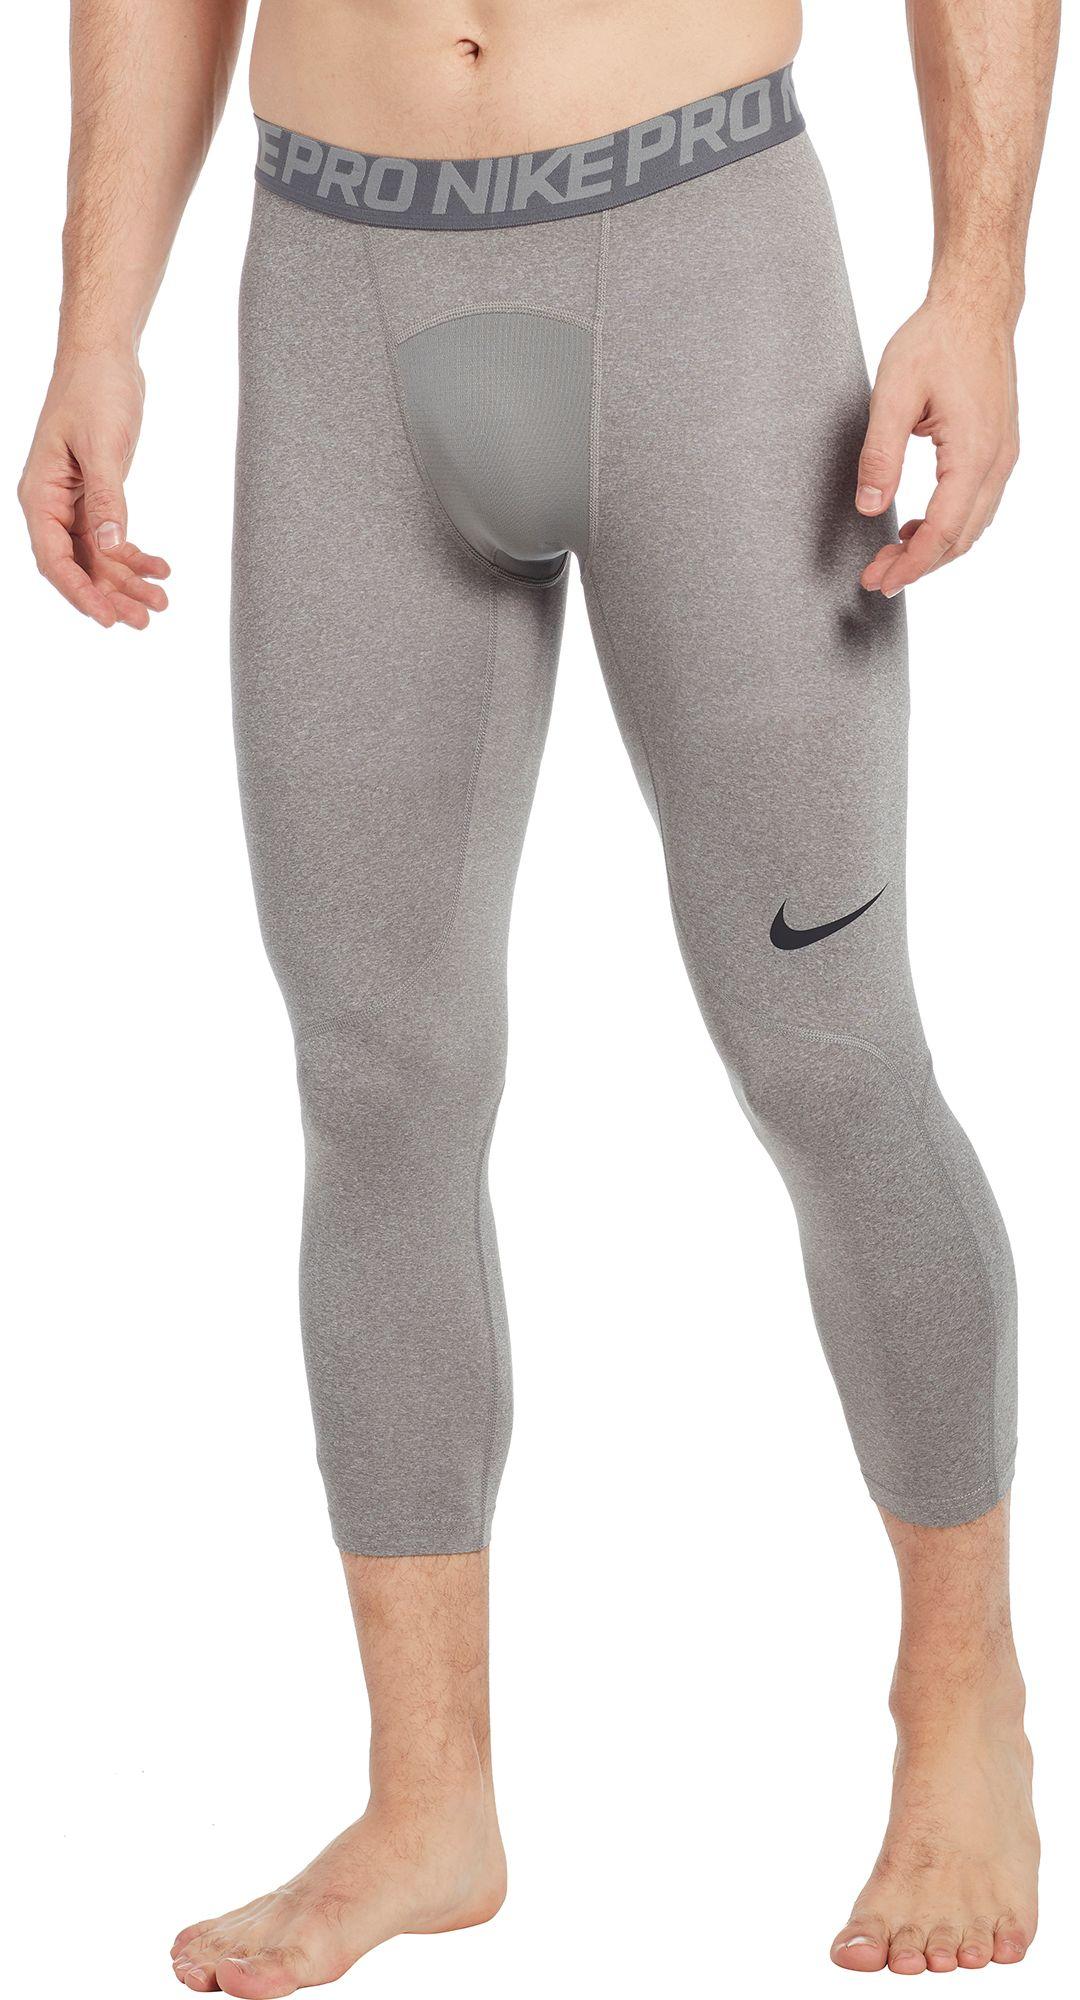 8ef74412e1 Nike Men's Pro 3/4 Length Tights | DICK'S Sporting Goods